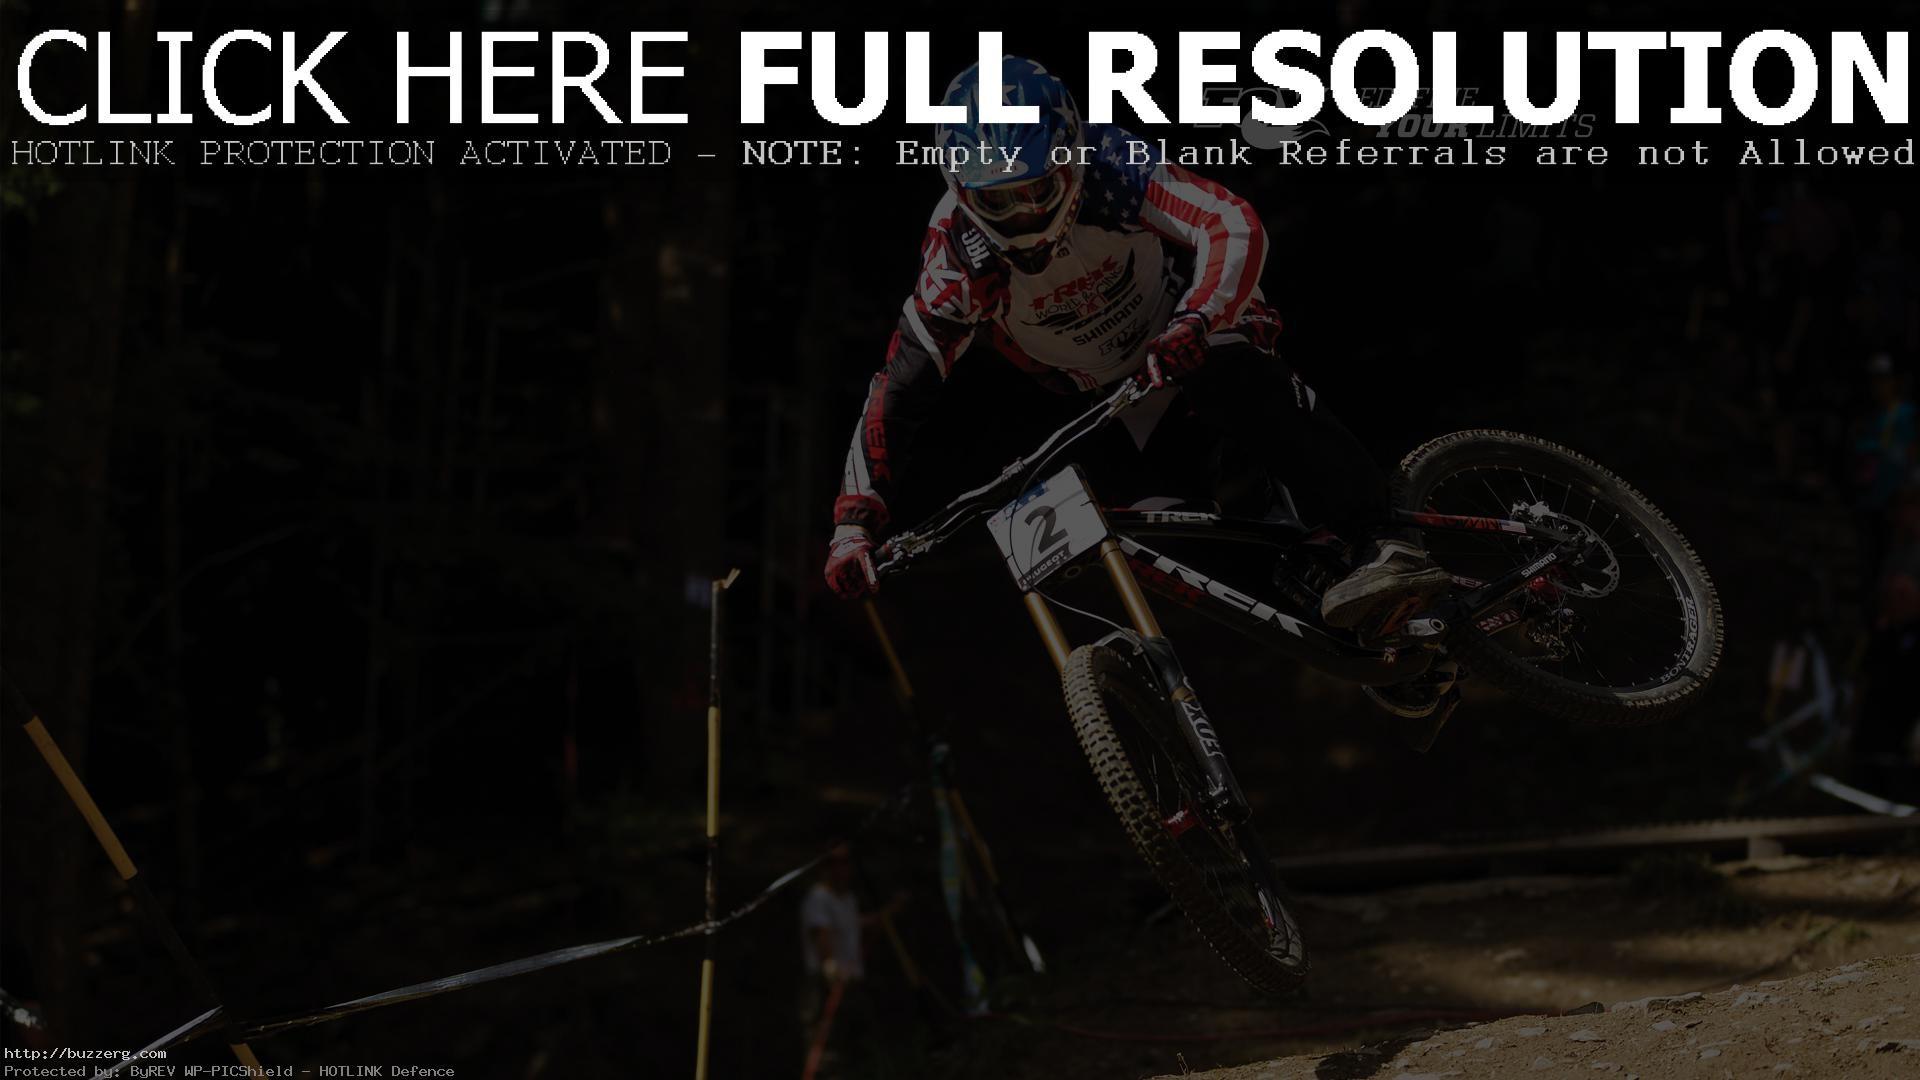 HD Wallpaper · Fox Racing Aaron Gwin Bike Team (id: 179516)